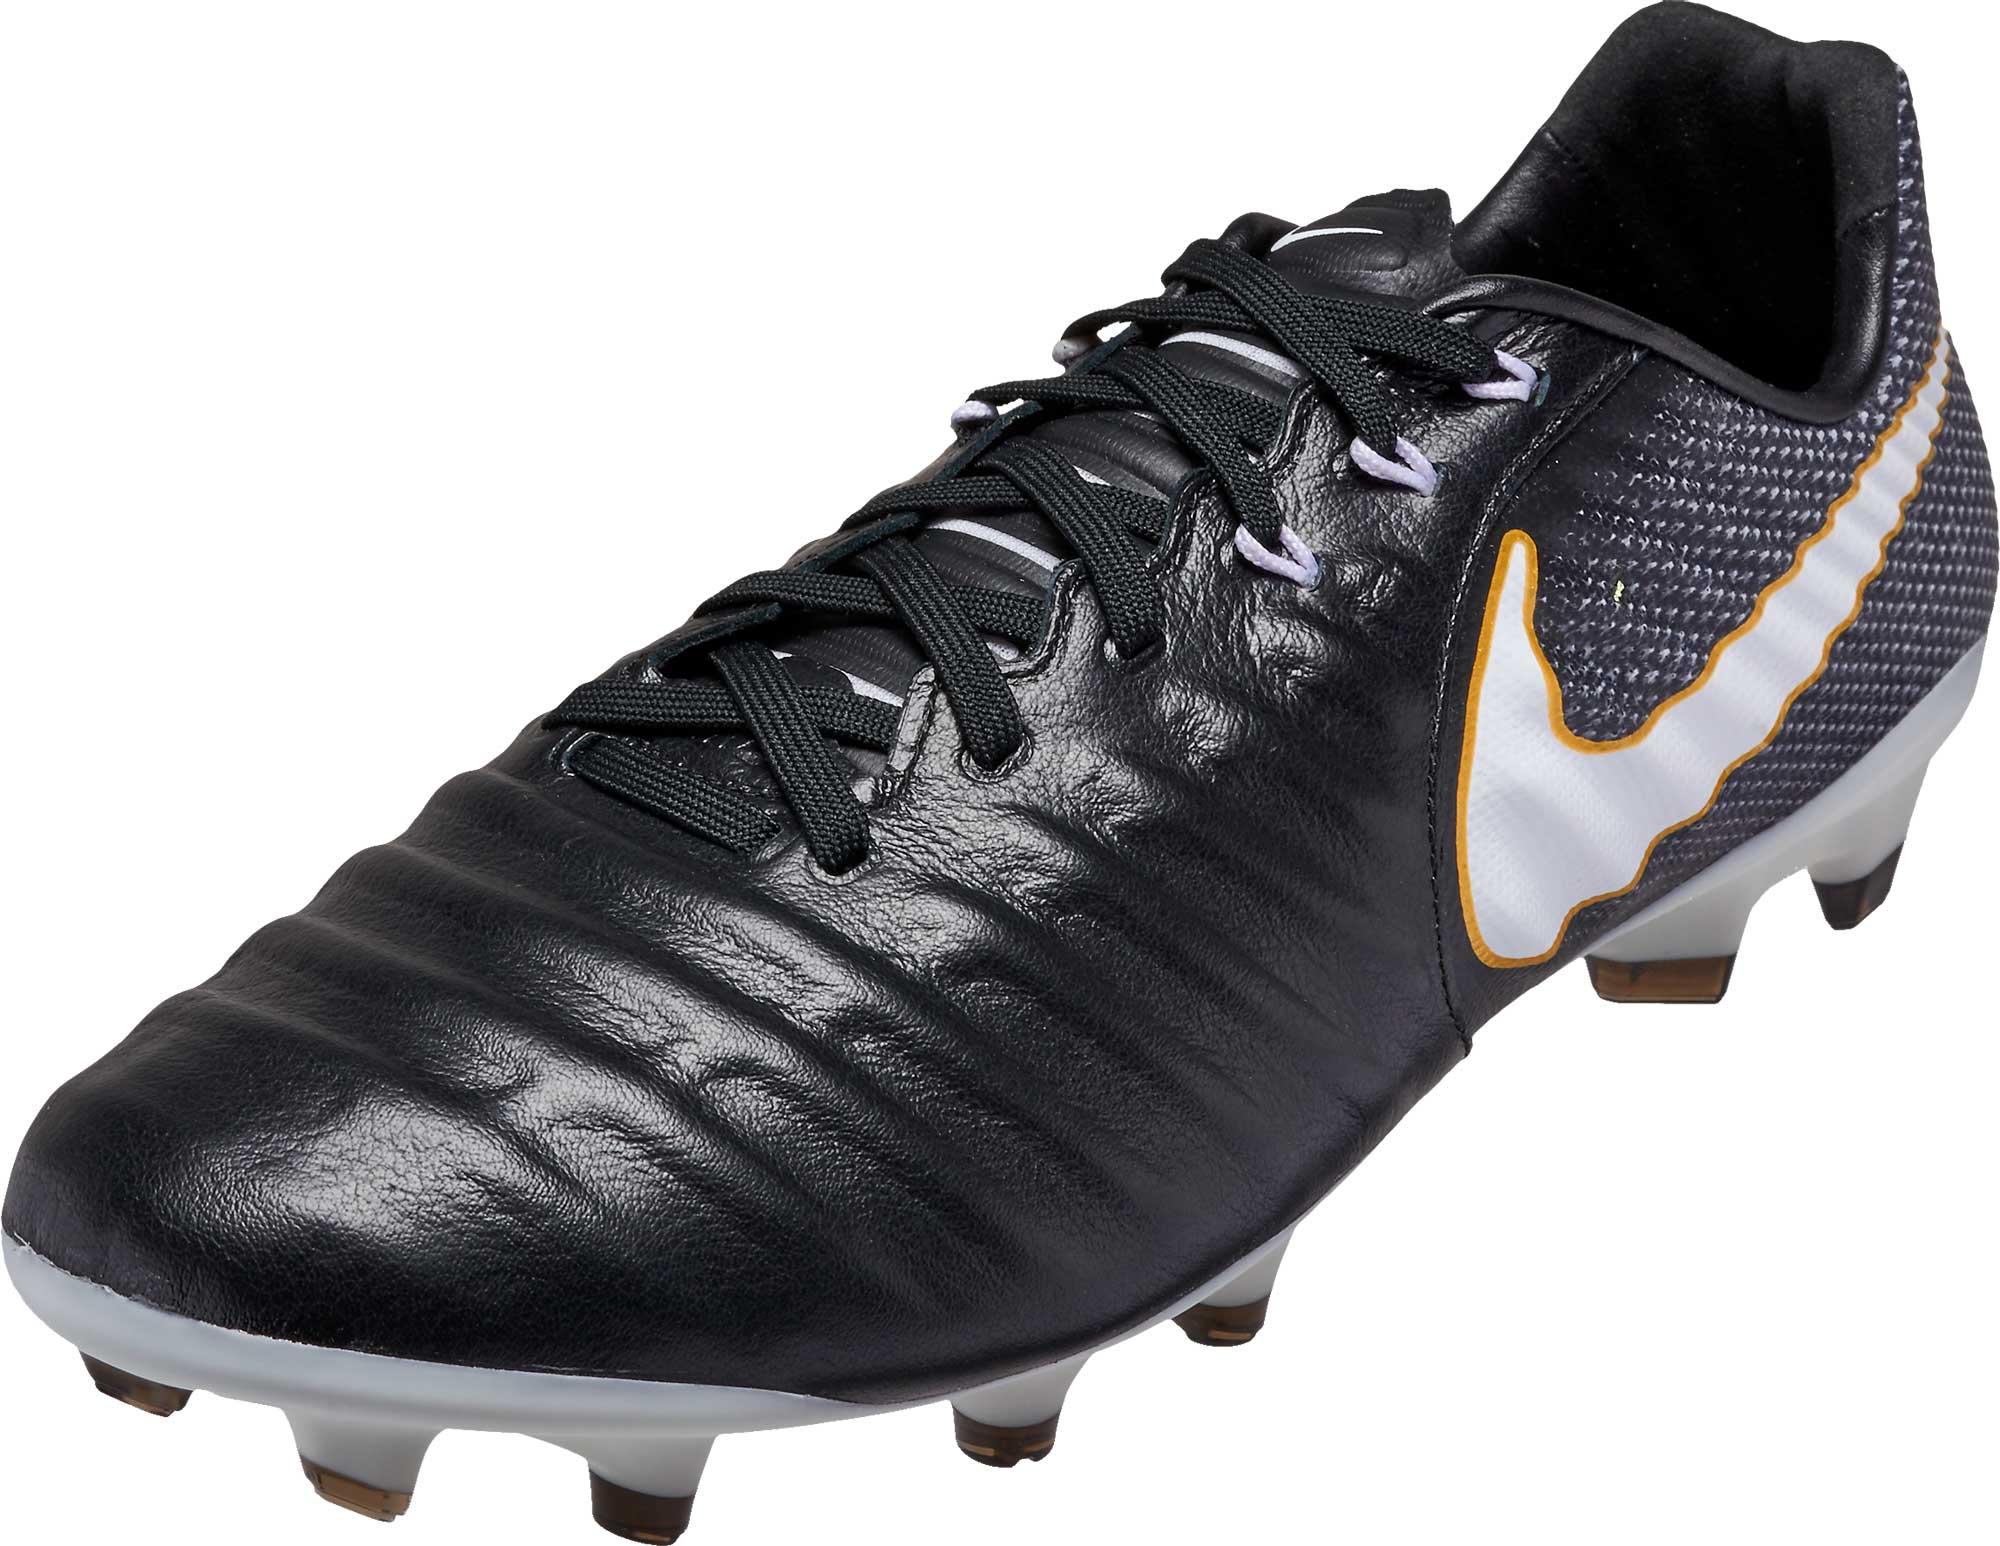 dd11a69ece0 Nike Tiempo Legacy III FG Soccer Cleats - Black   White - Soccer Master